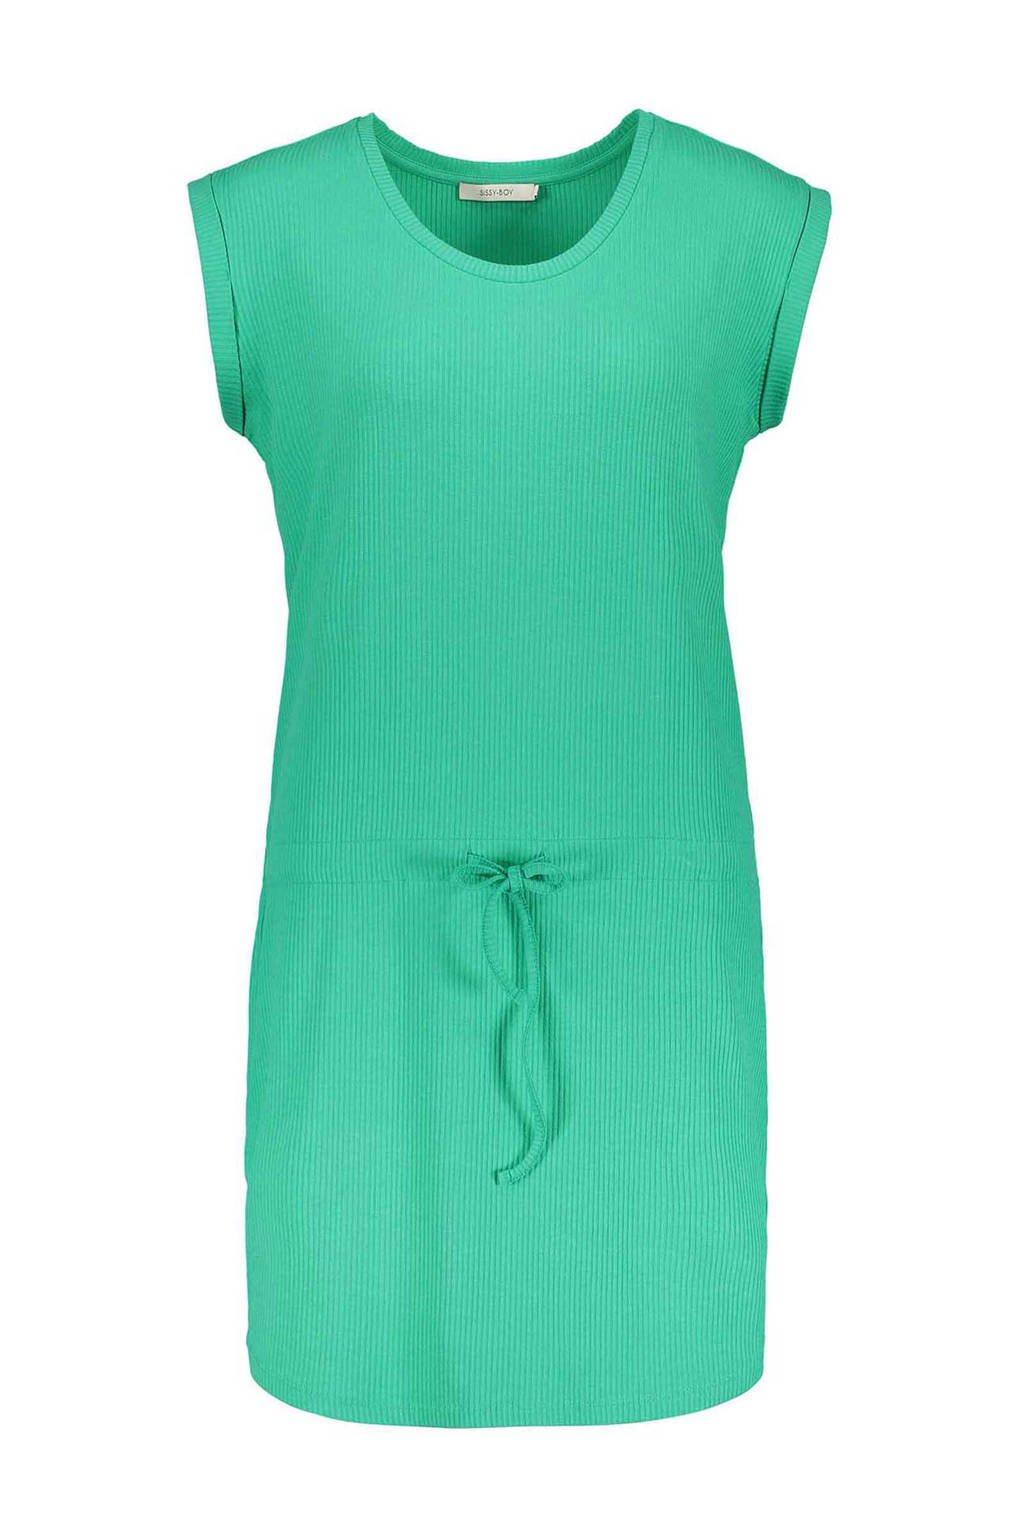 Sissy-Boy jurk, Groen